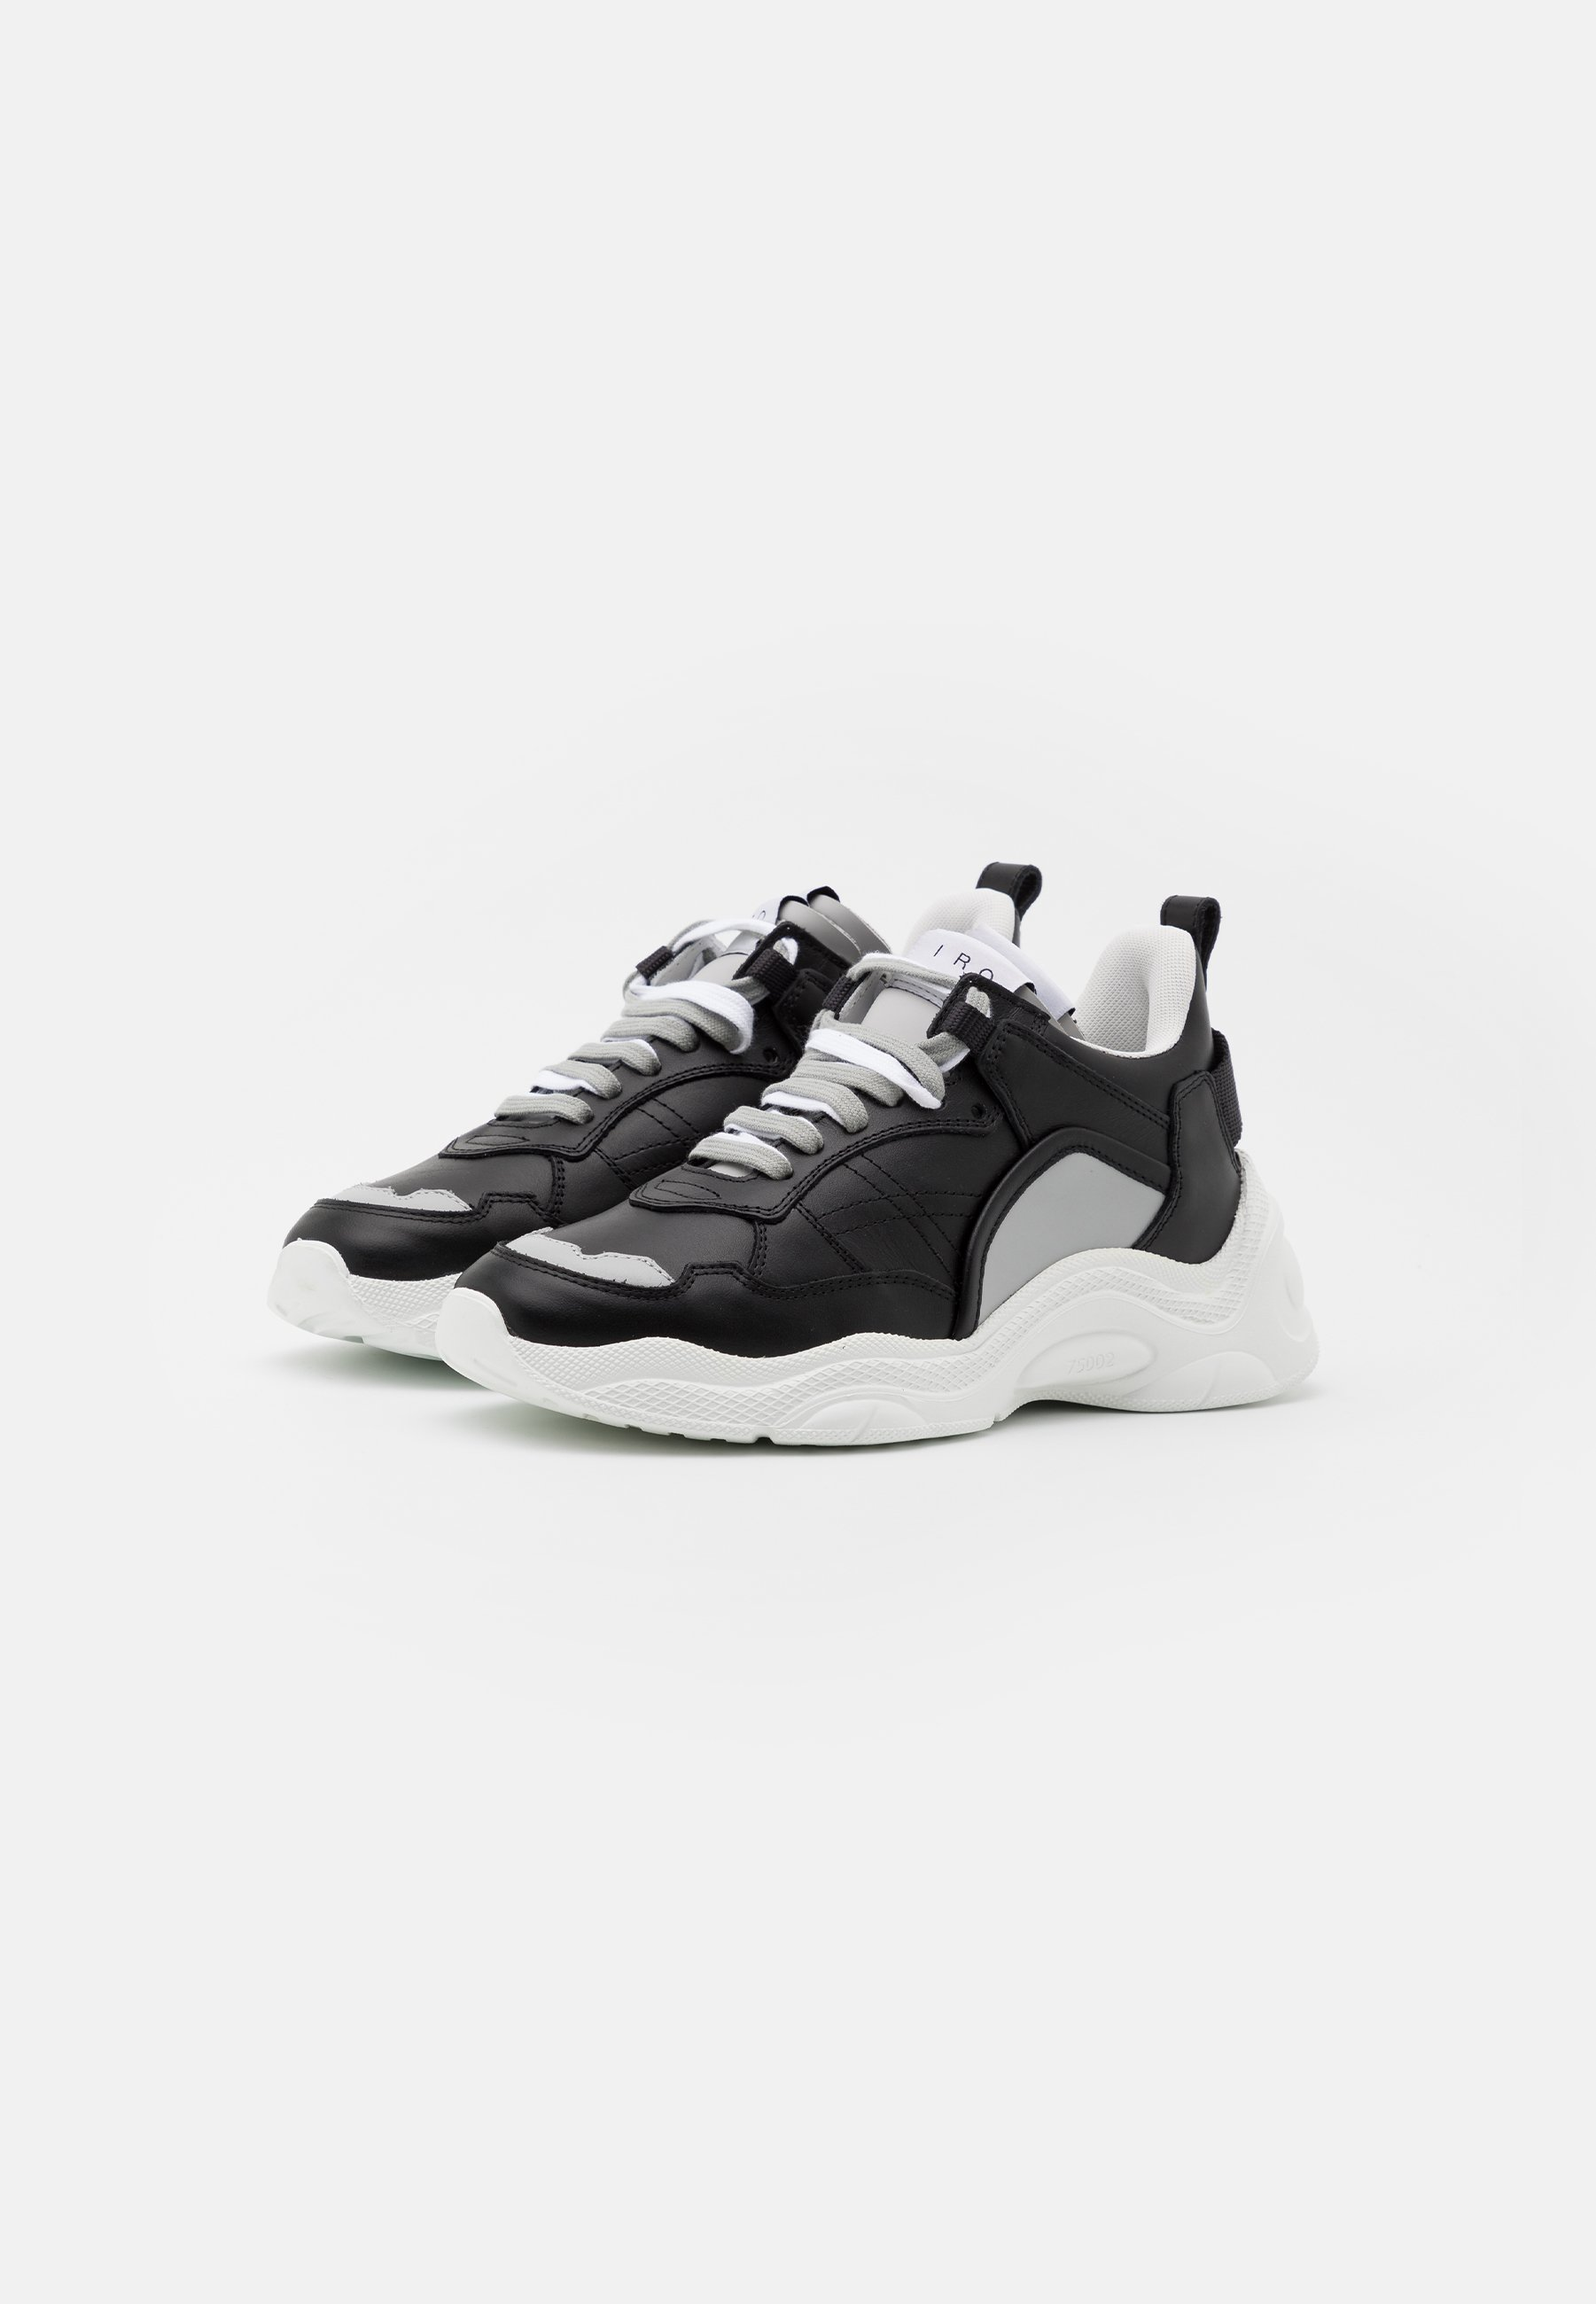 Iro Curverunner - Sneakers Black/grey